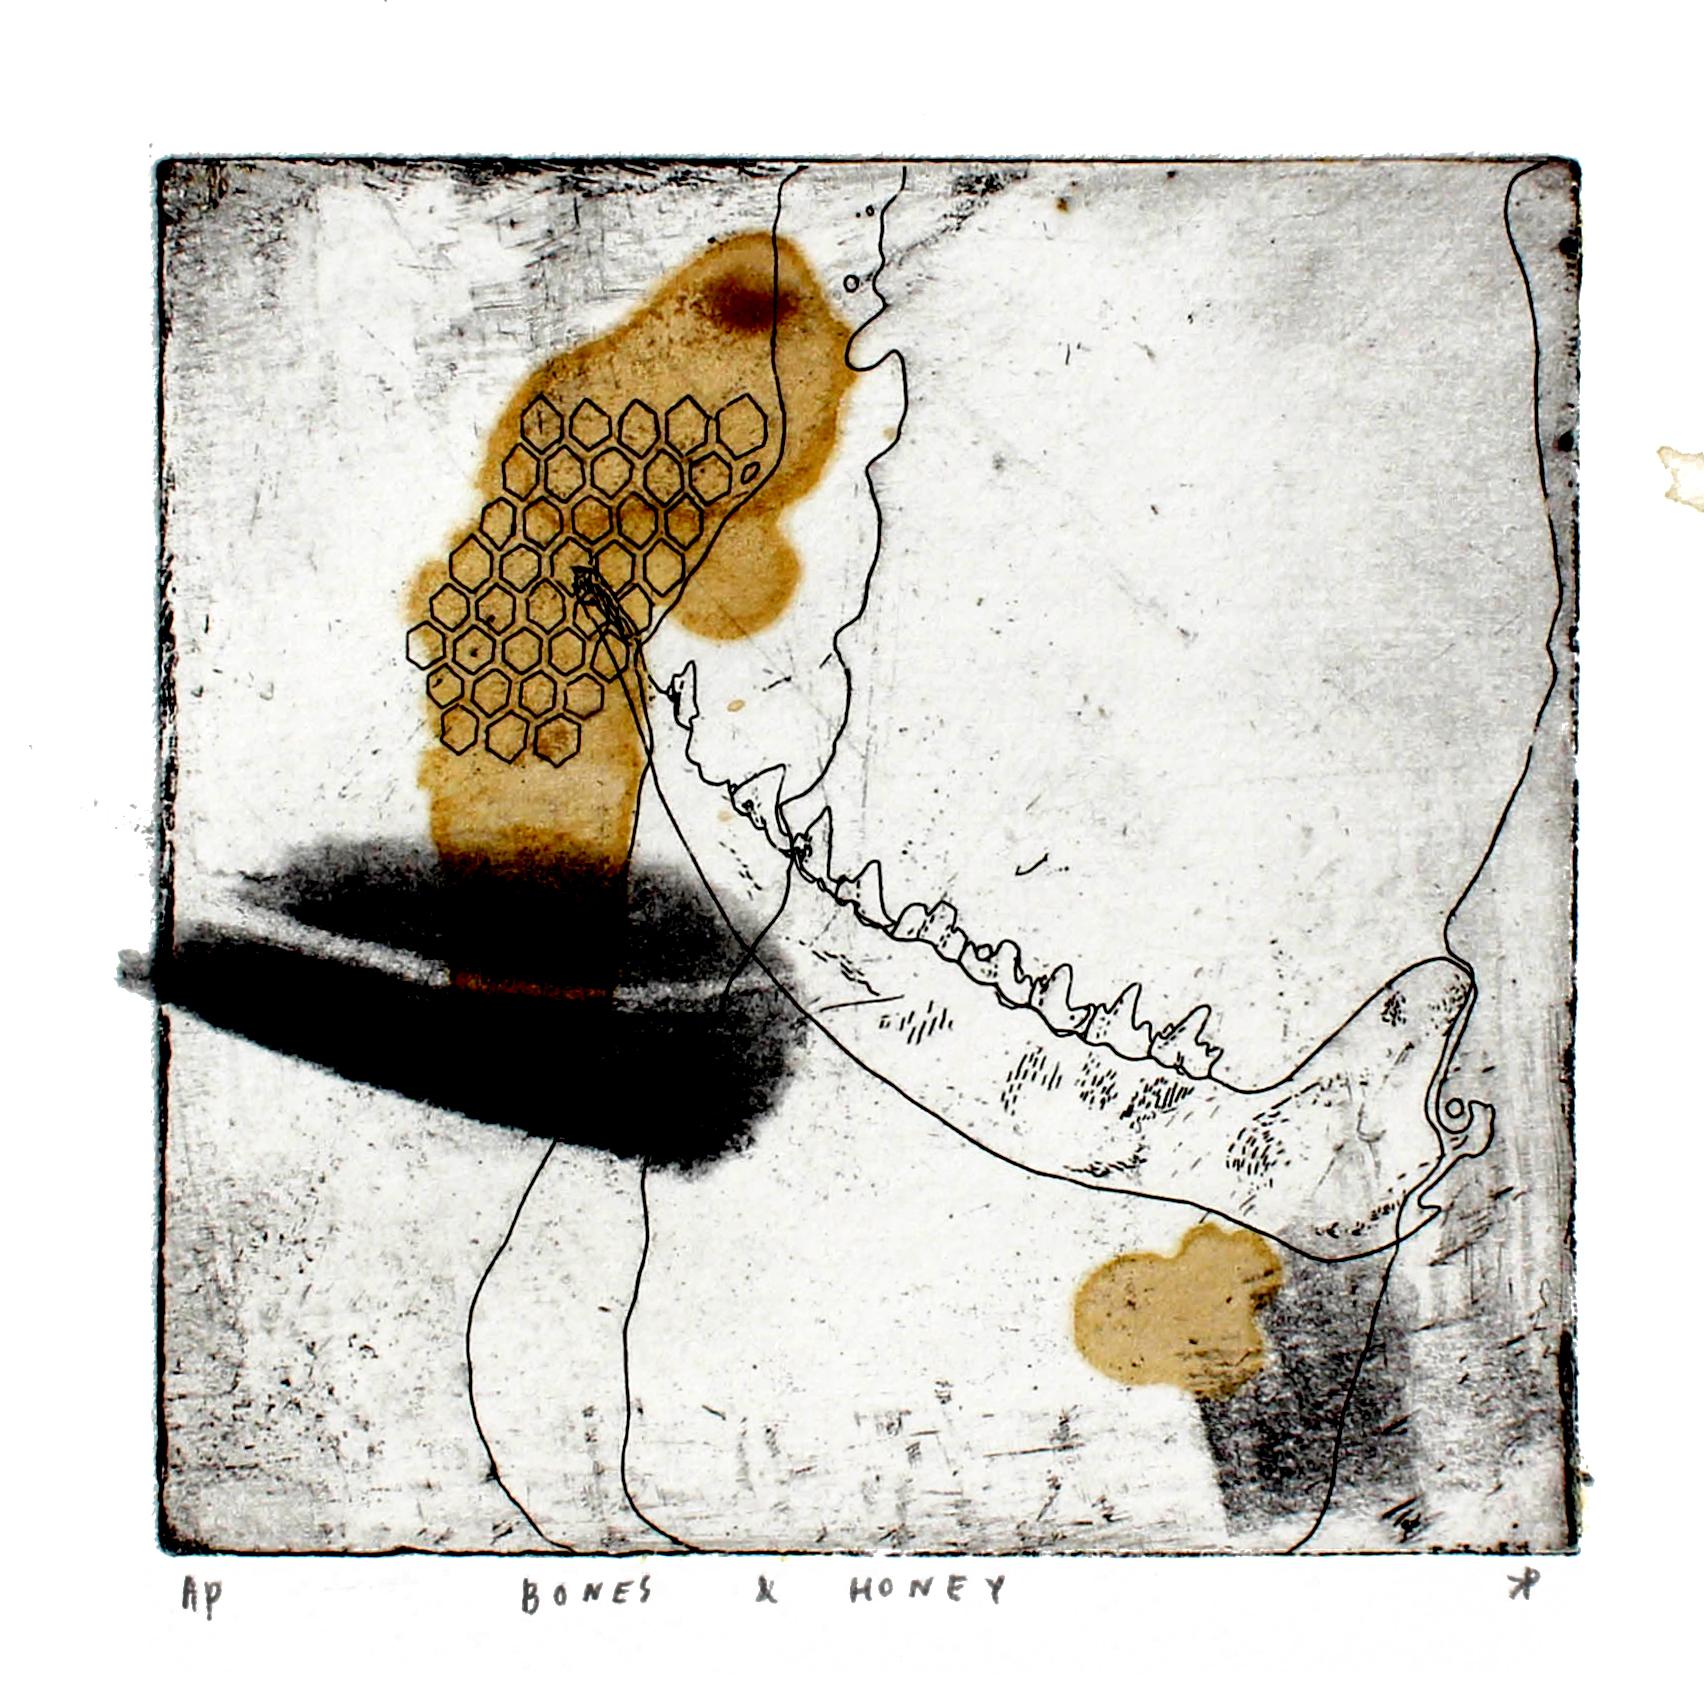 bones and honey